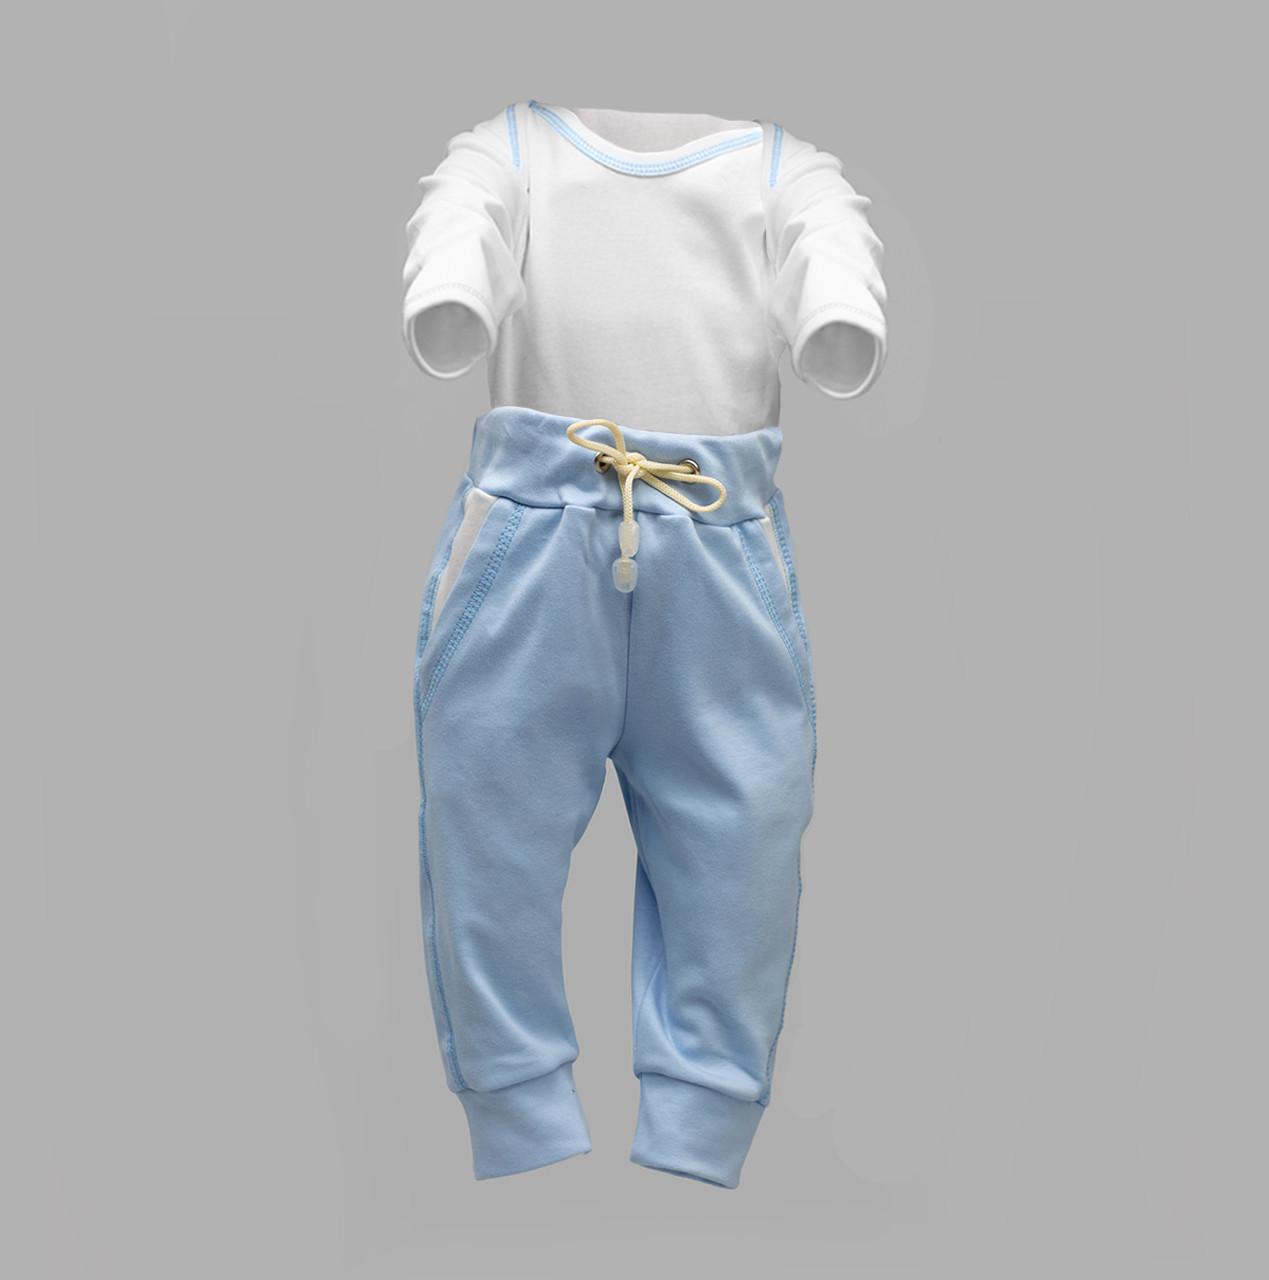 Боди-лодочка с длинным рукавом и штаны для ребенка Интерлок | Боді та штани для дитини